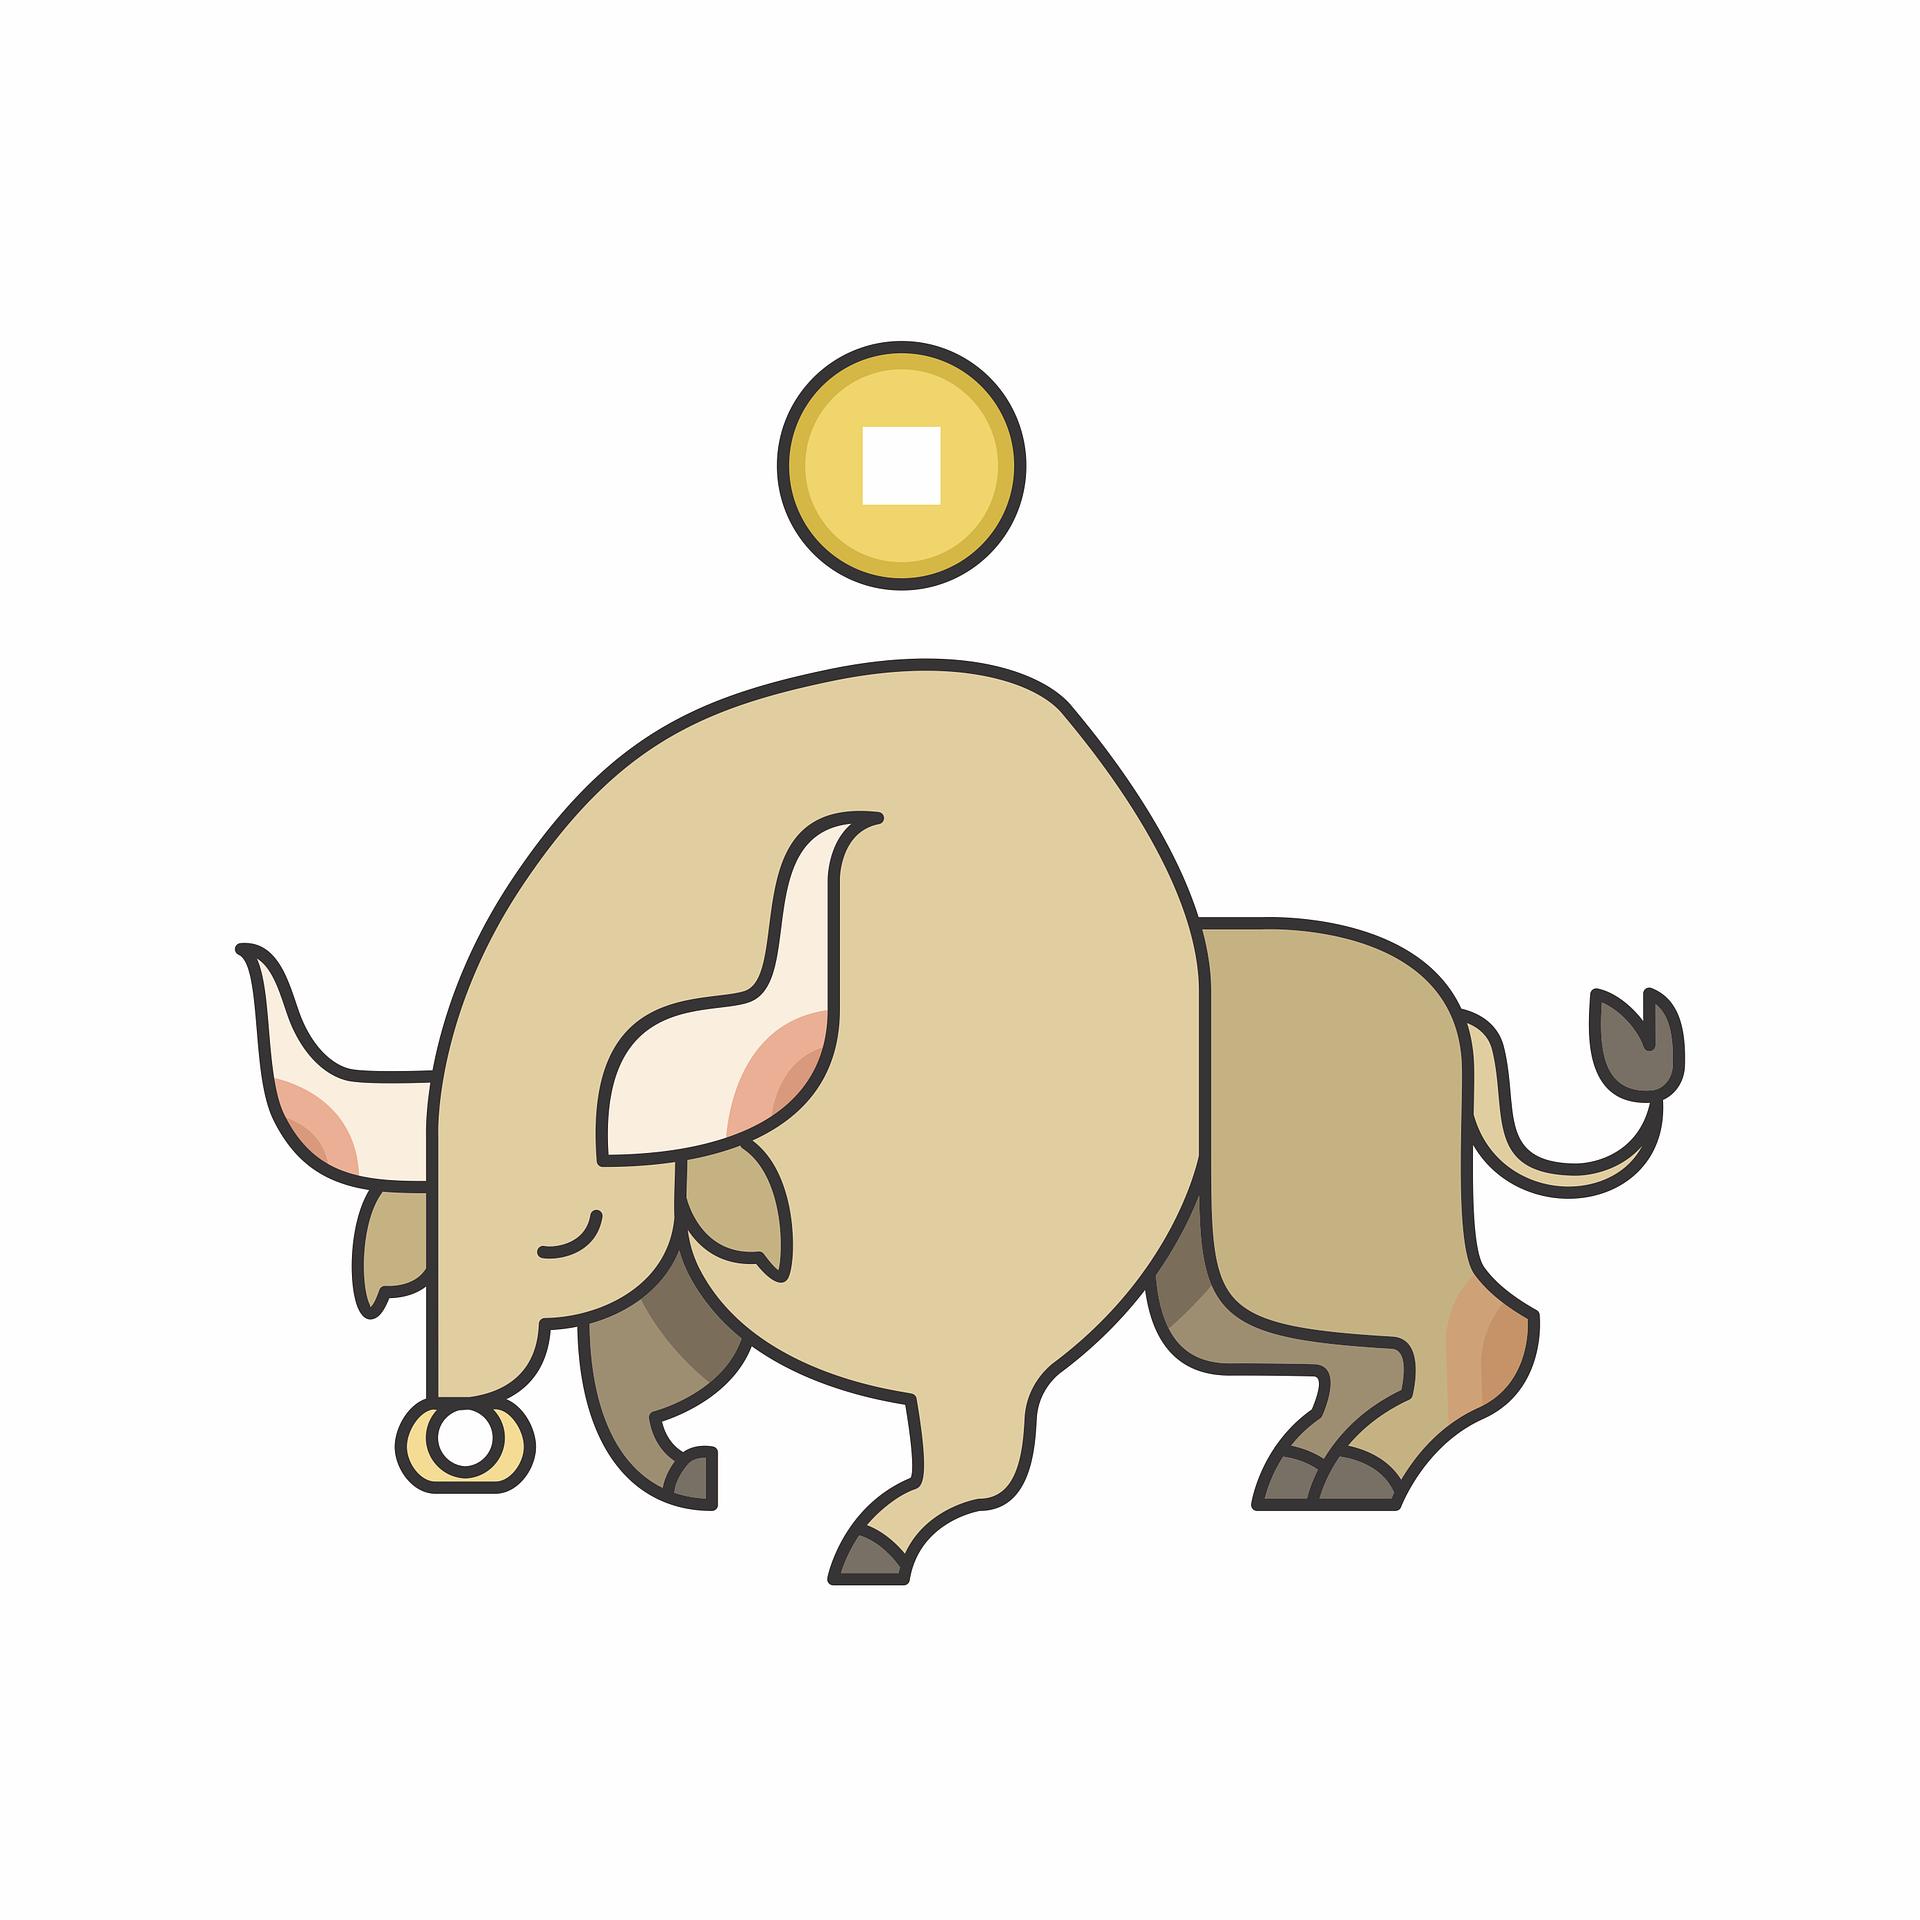 2021 anno del bufalo